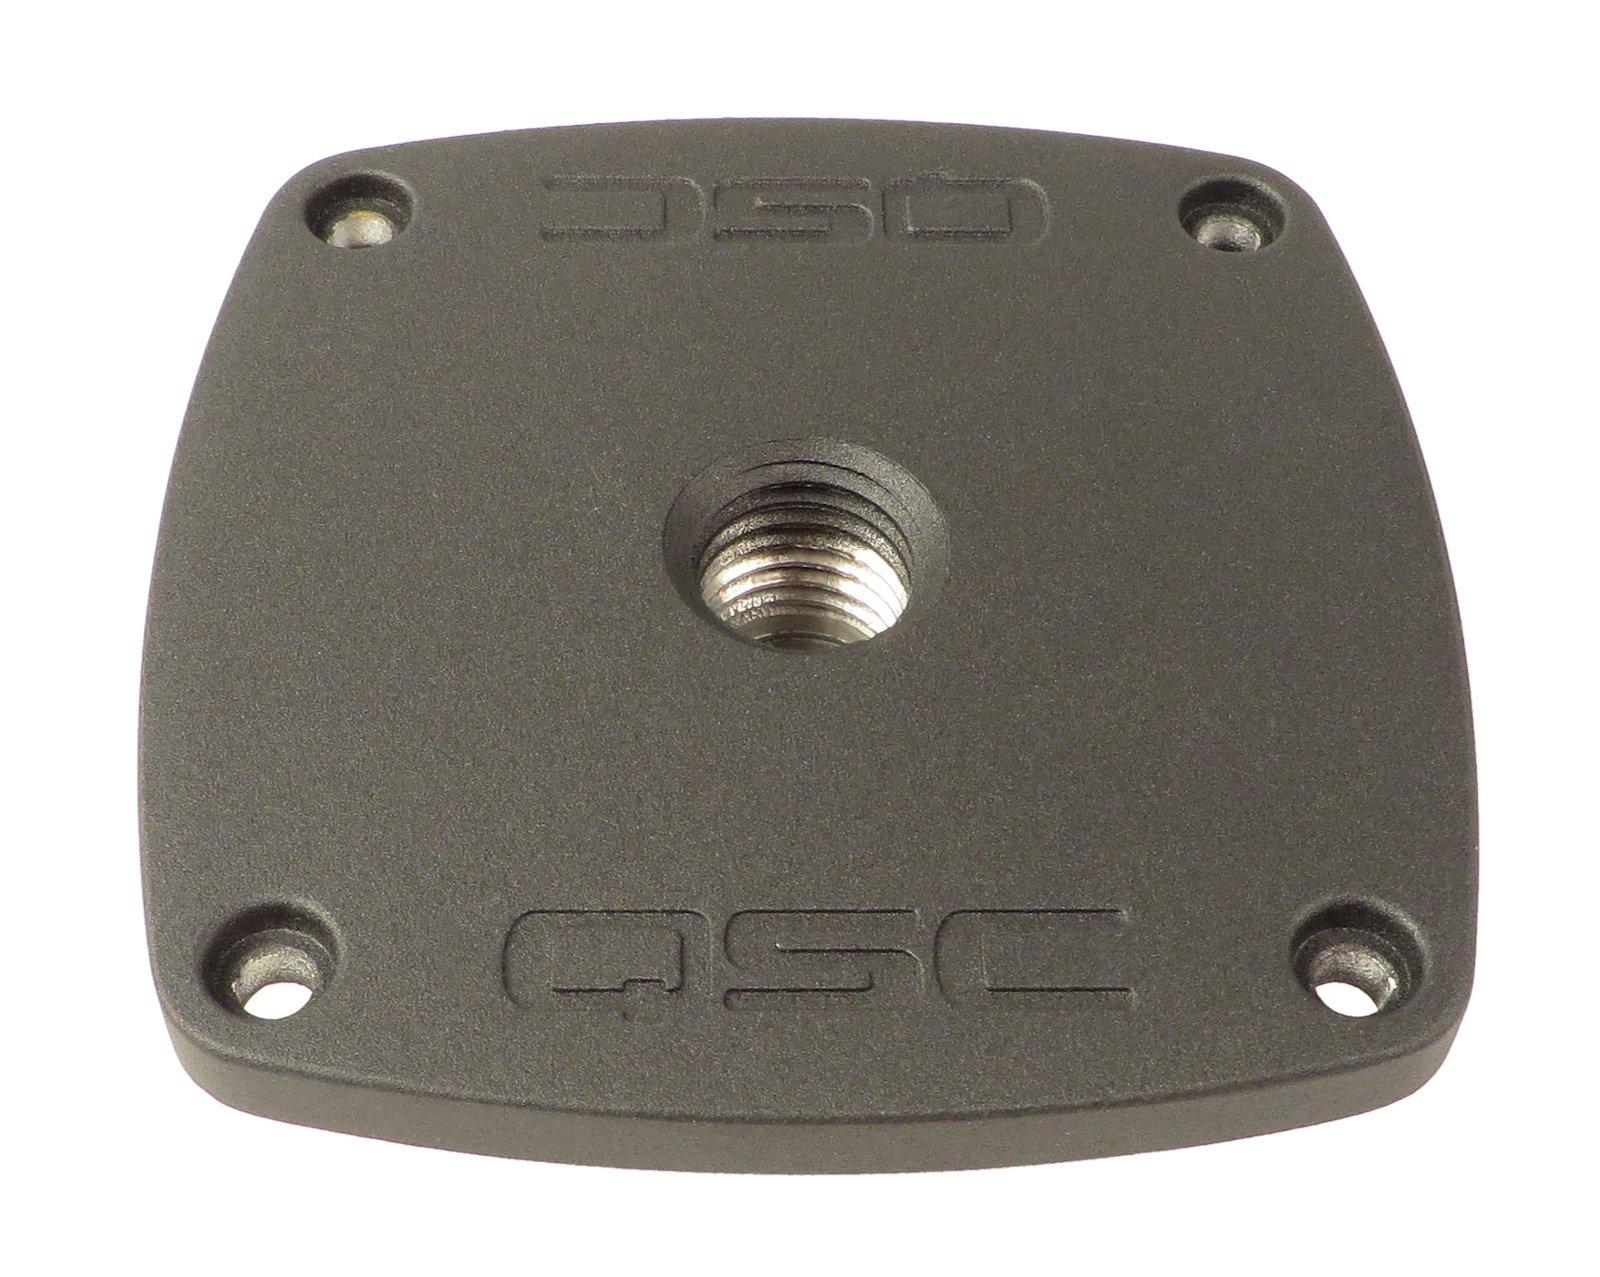 QSC CH-000889-00  KSub Pole Cup CH-000889-00